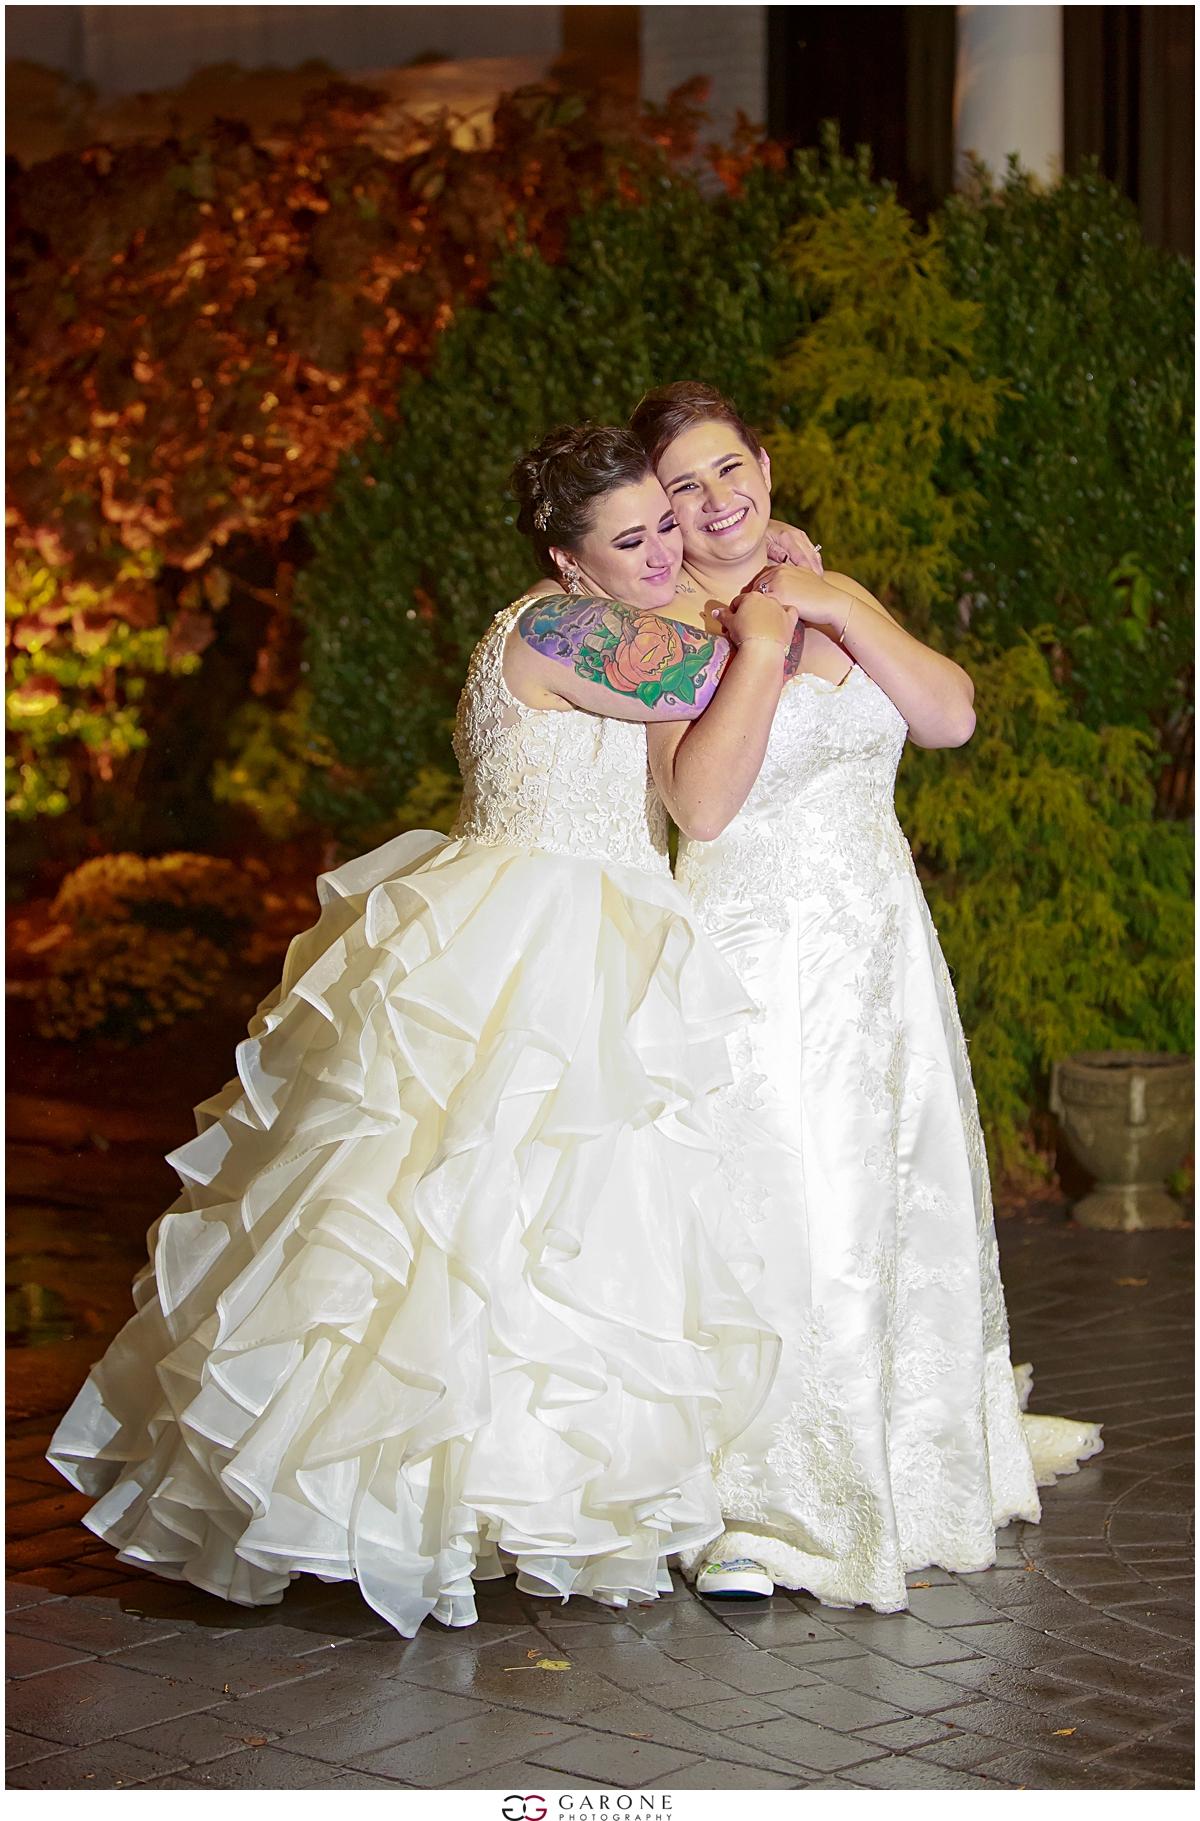 Jenna_Nicole_Castleton_Wedding_Love_is_love_NH_Wedding_Photographer_Garone_Photography_0001.jpg